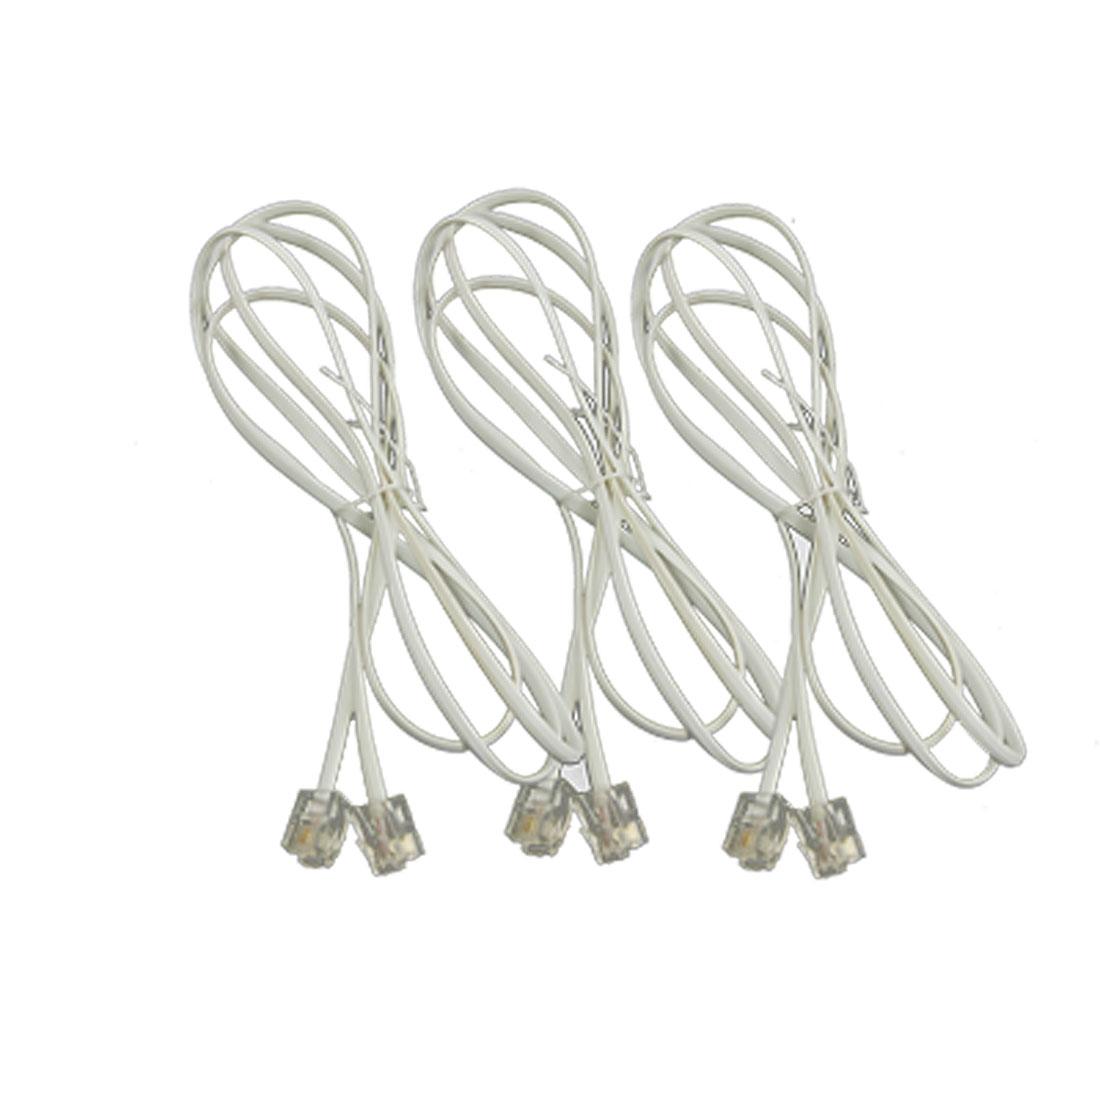 3 Pcs 1.2M 3.9Ft RJ11 Telephone Phone Extension Cord Cable